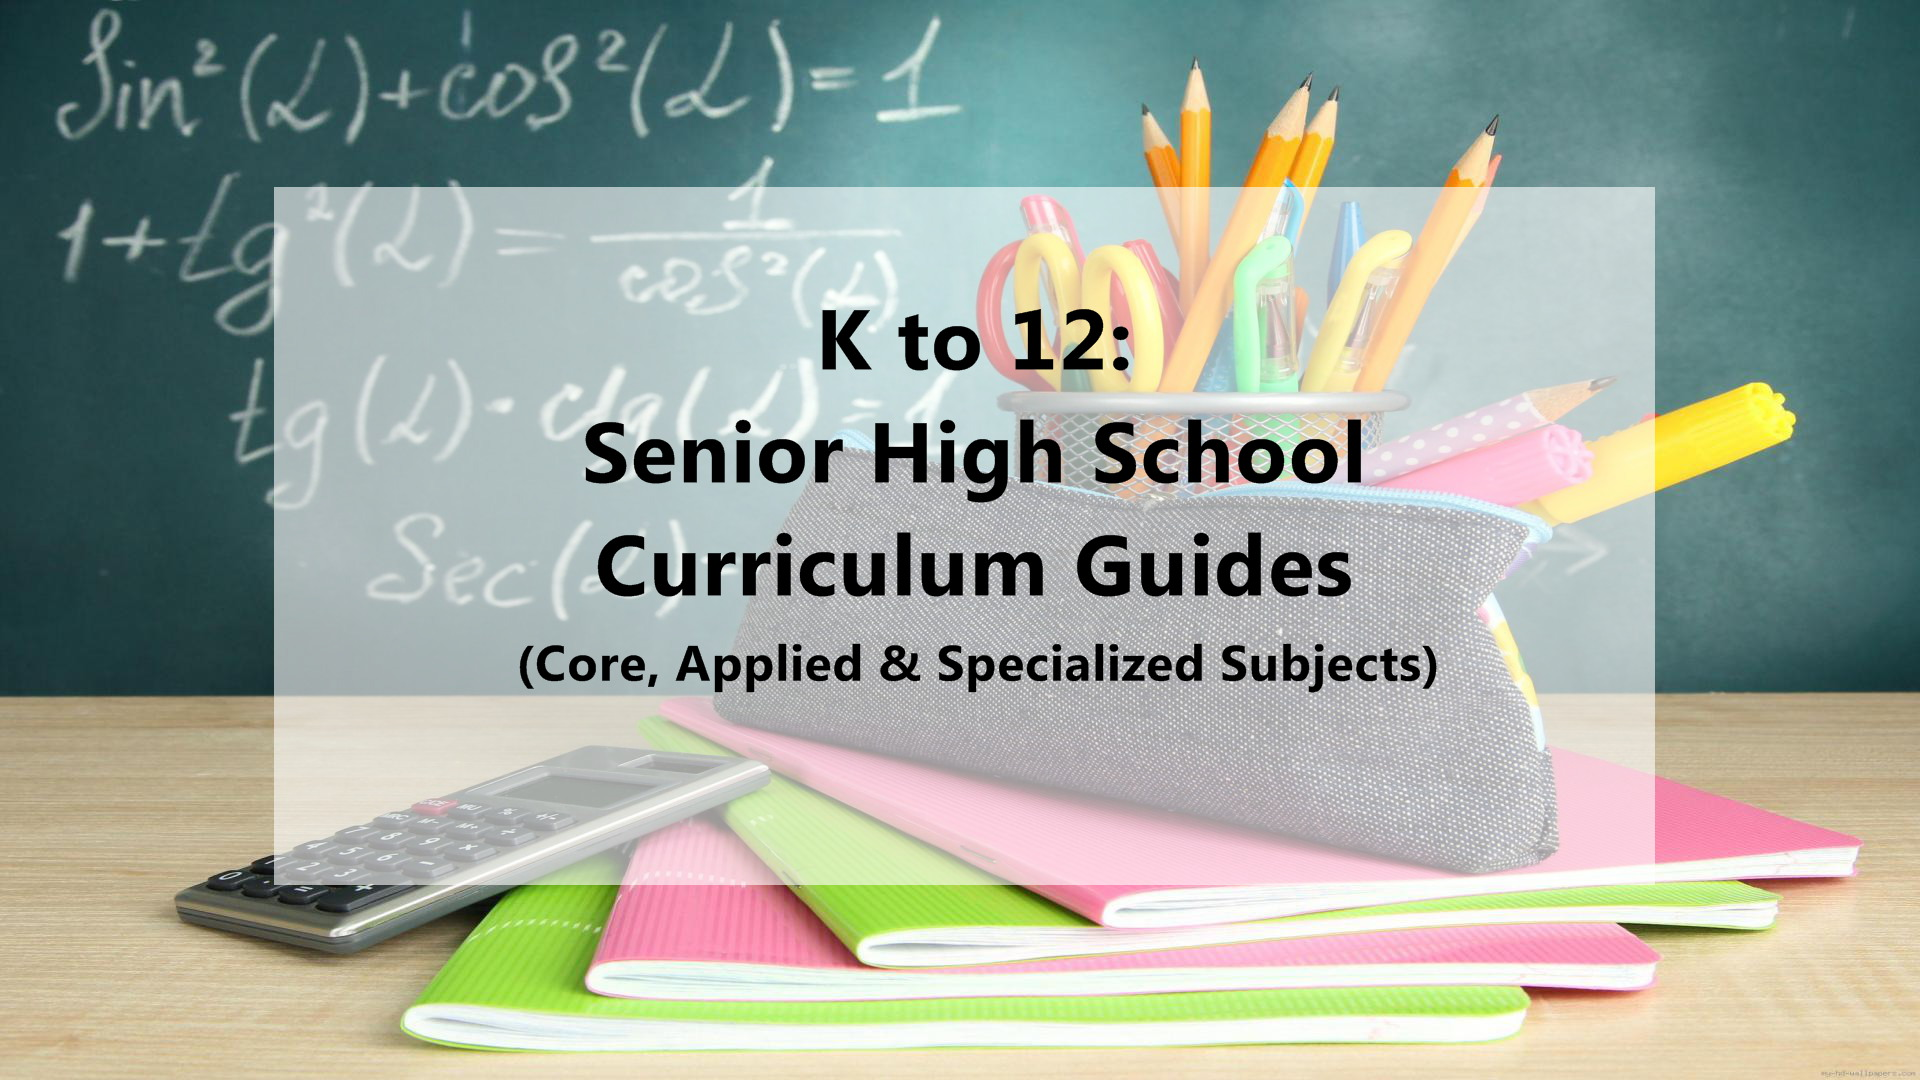 K to 12: Senior High School Curriculum Guides 2017